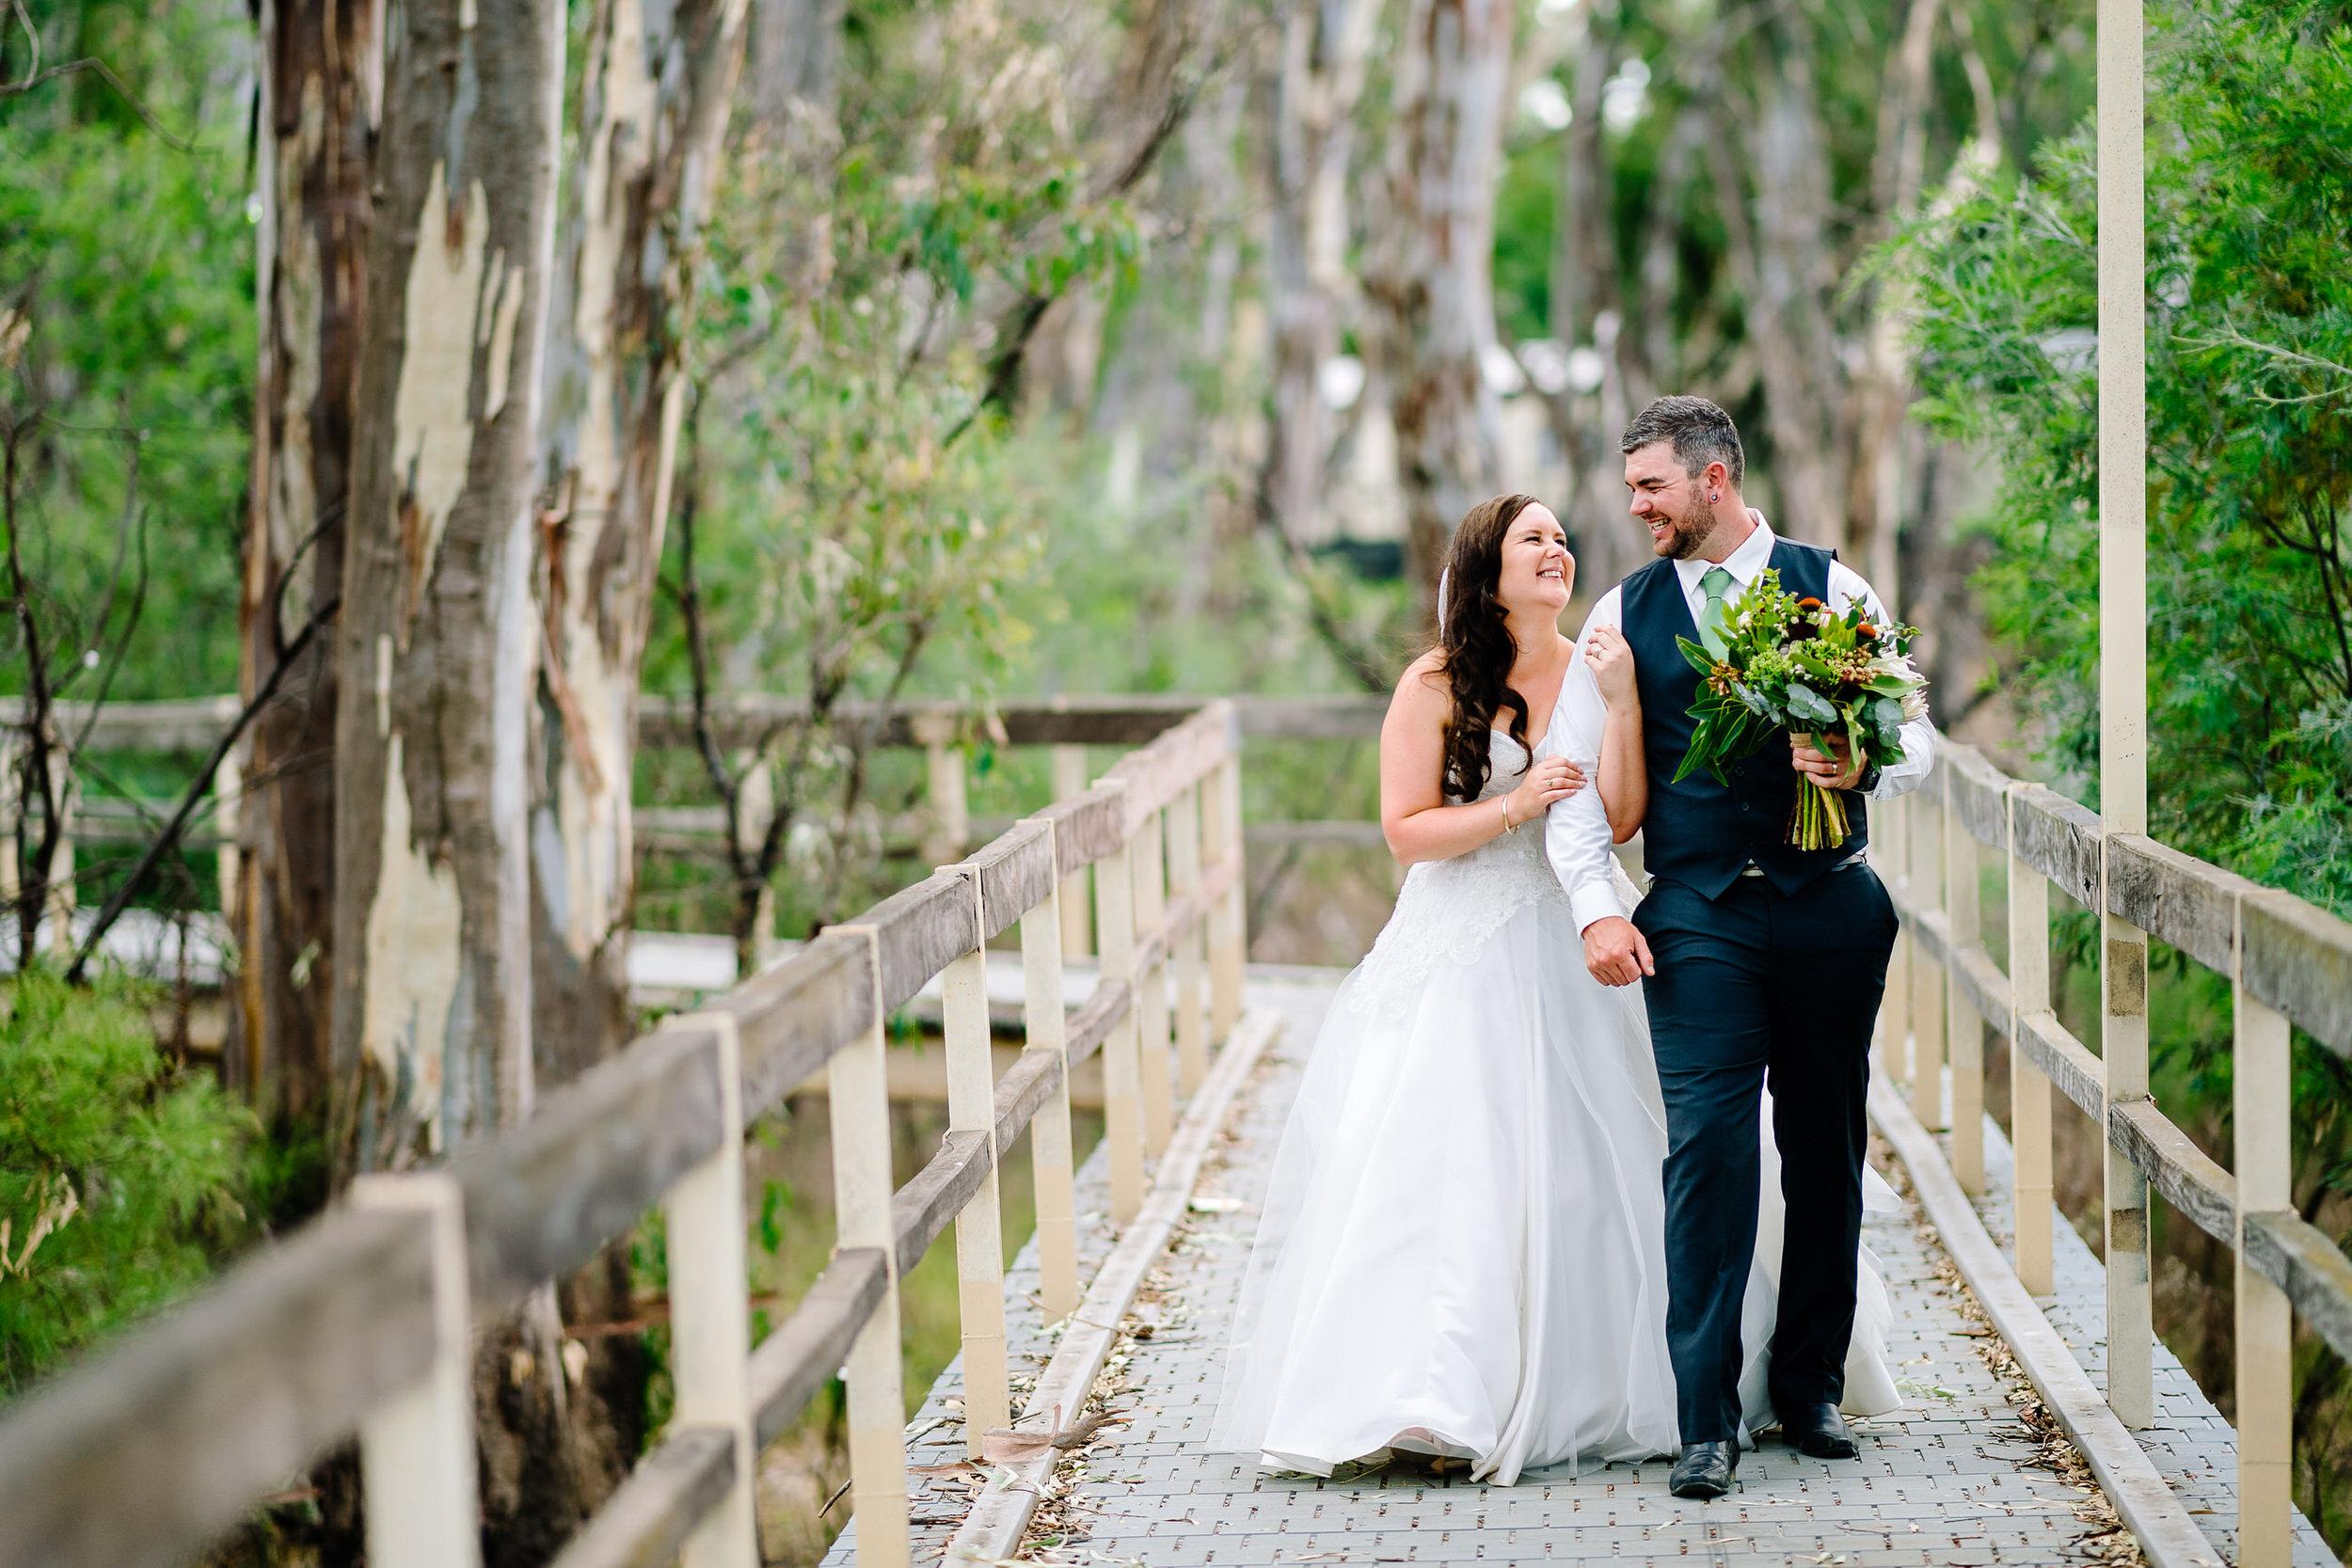 Justin_Jim_Echuca_Wedding_Photography_Tindarra-270.JPG